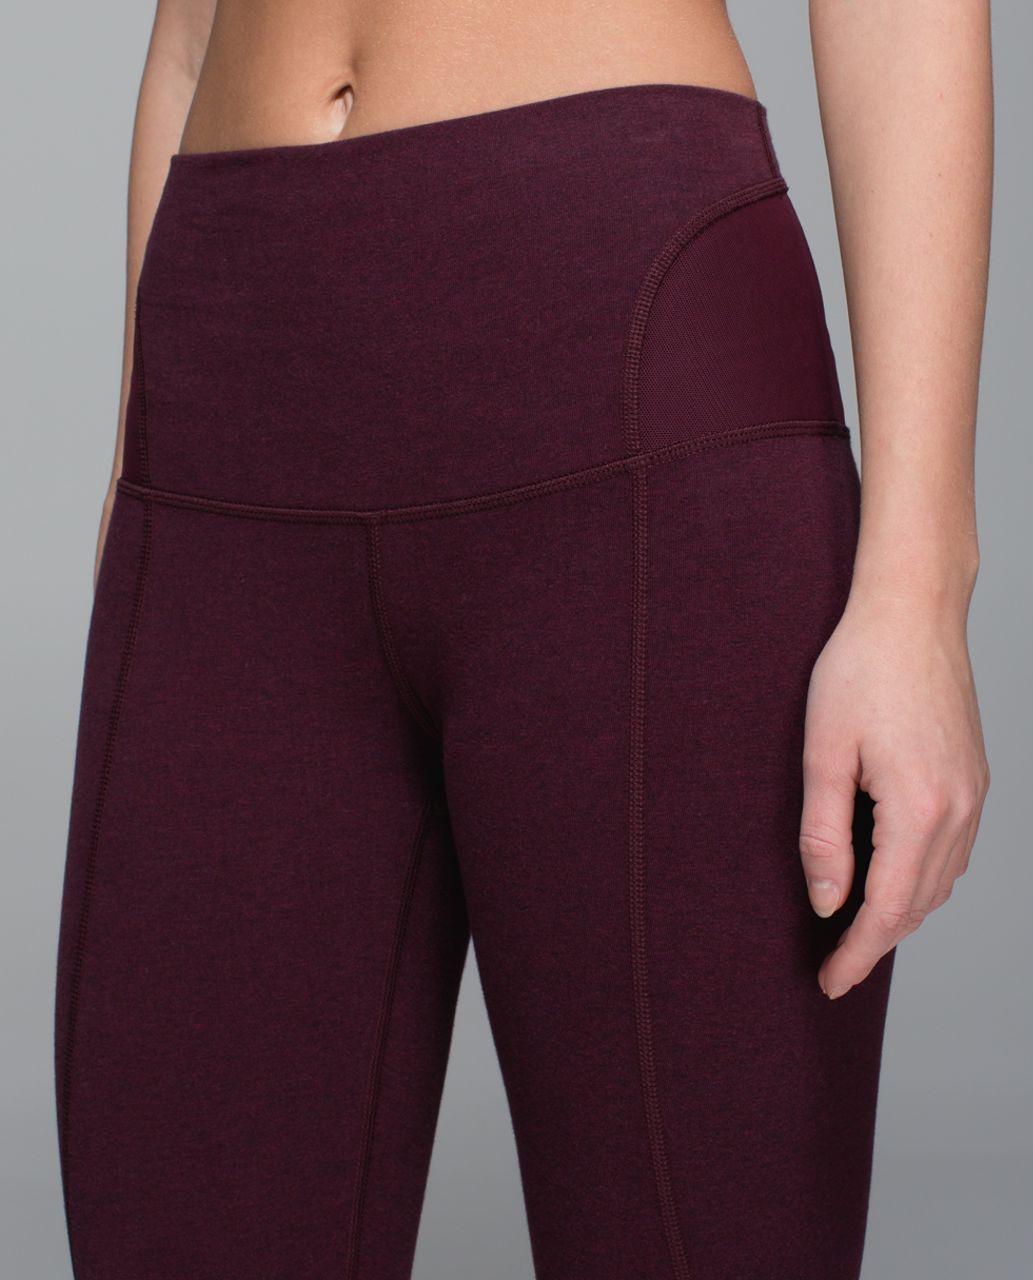 Lululemon Devi Yoga Pant - Heathered Bordeaux Drama   Black Cherry ... d540d6a703f5d